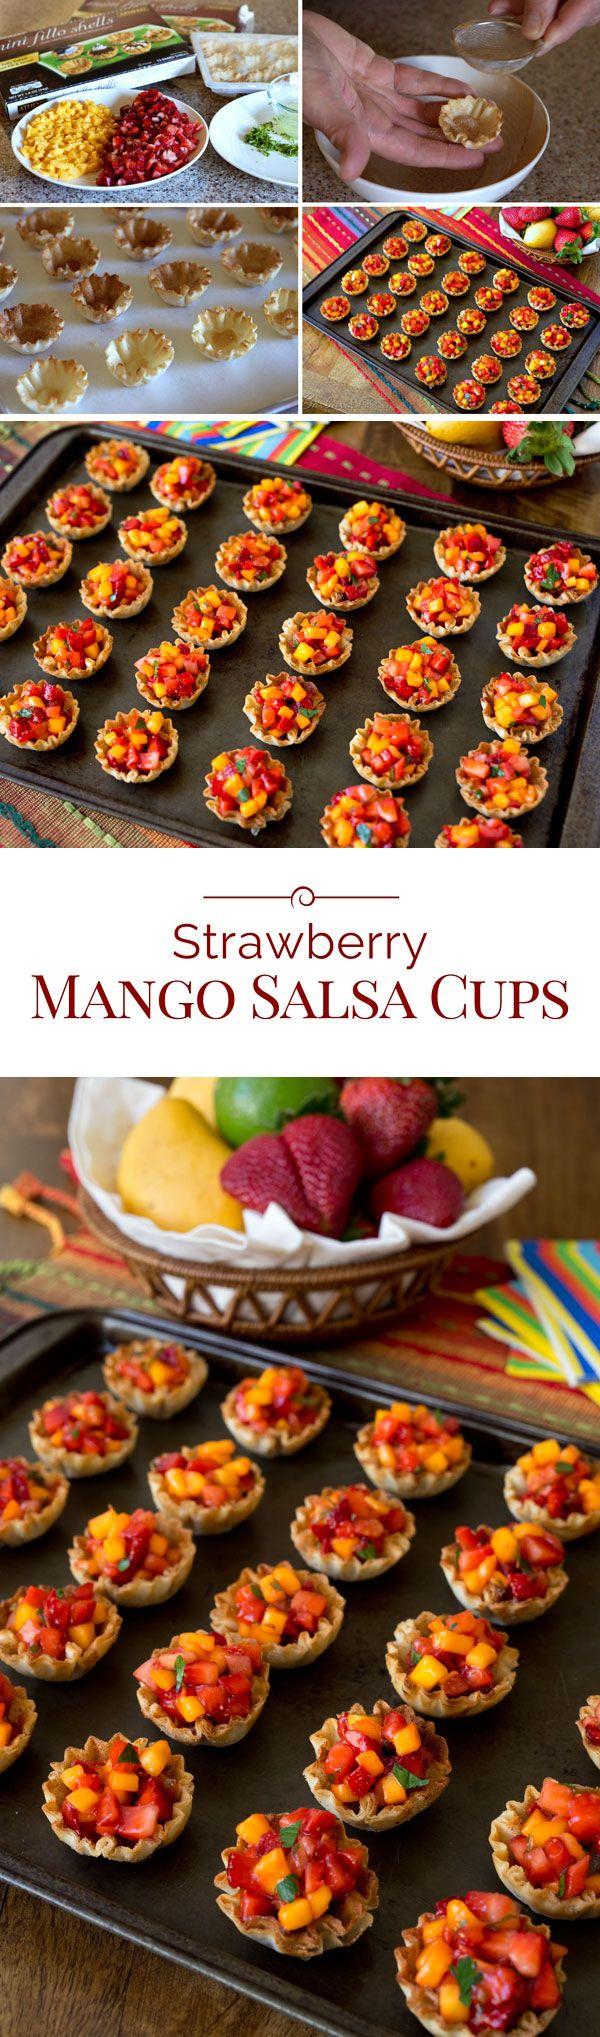 Strawberry Mango Salsa Cups